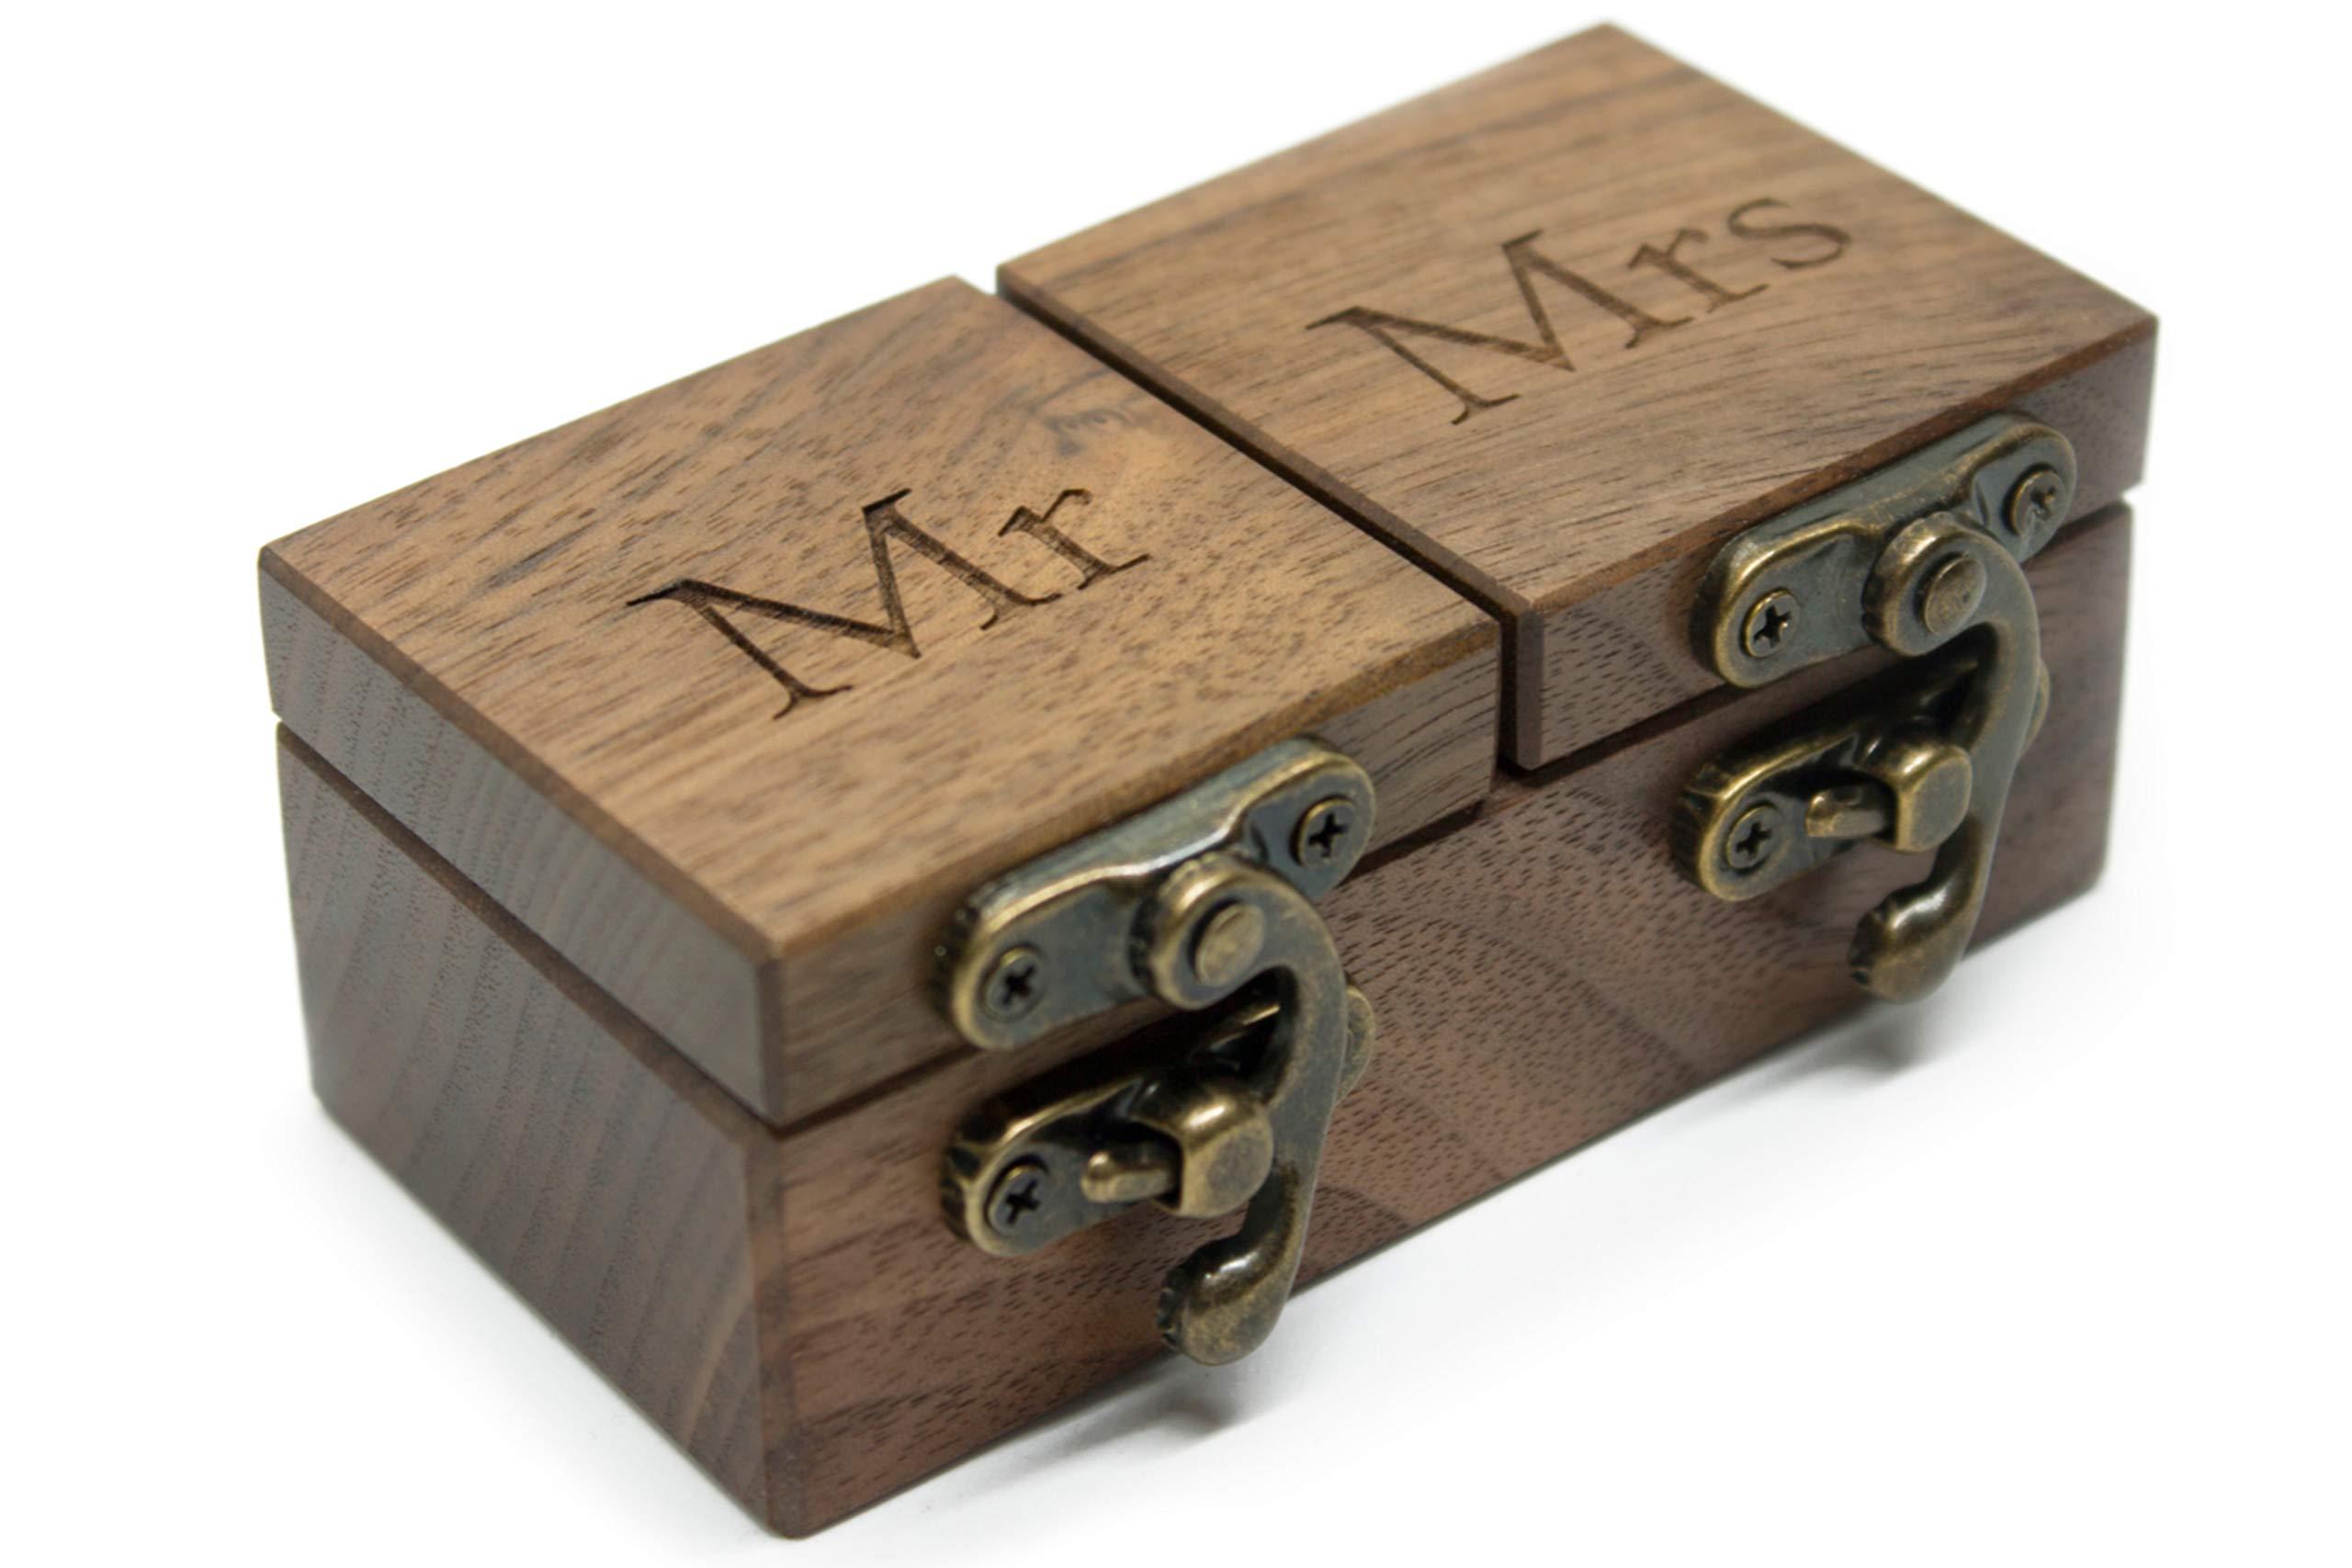 IdeaWoodCompany Ring Bearer Box - Pillow Alternative - Ring Holder Box - Wooden Wedding mrs mr Ring Box - Double Ring Box for Wedding Ceremony